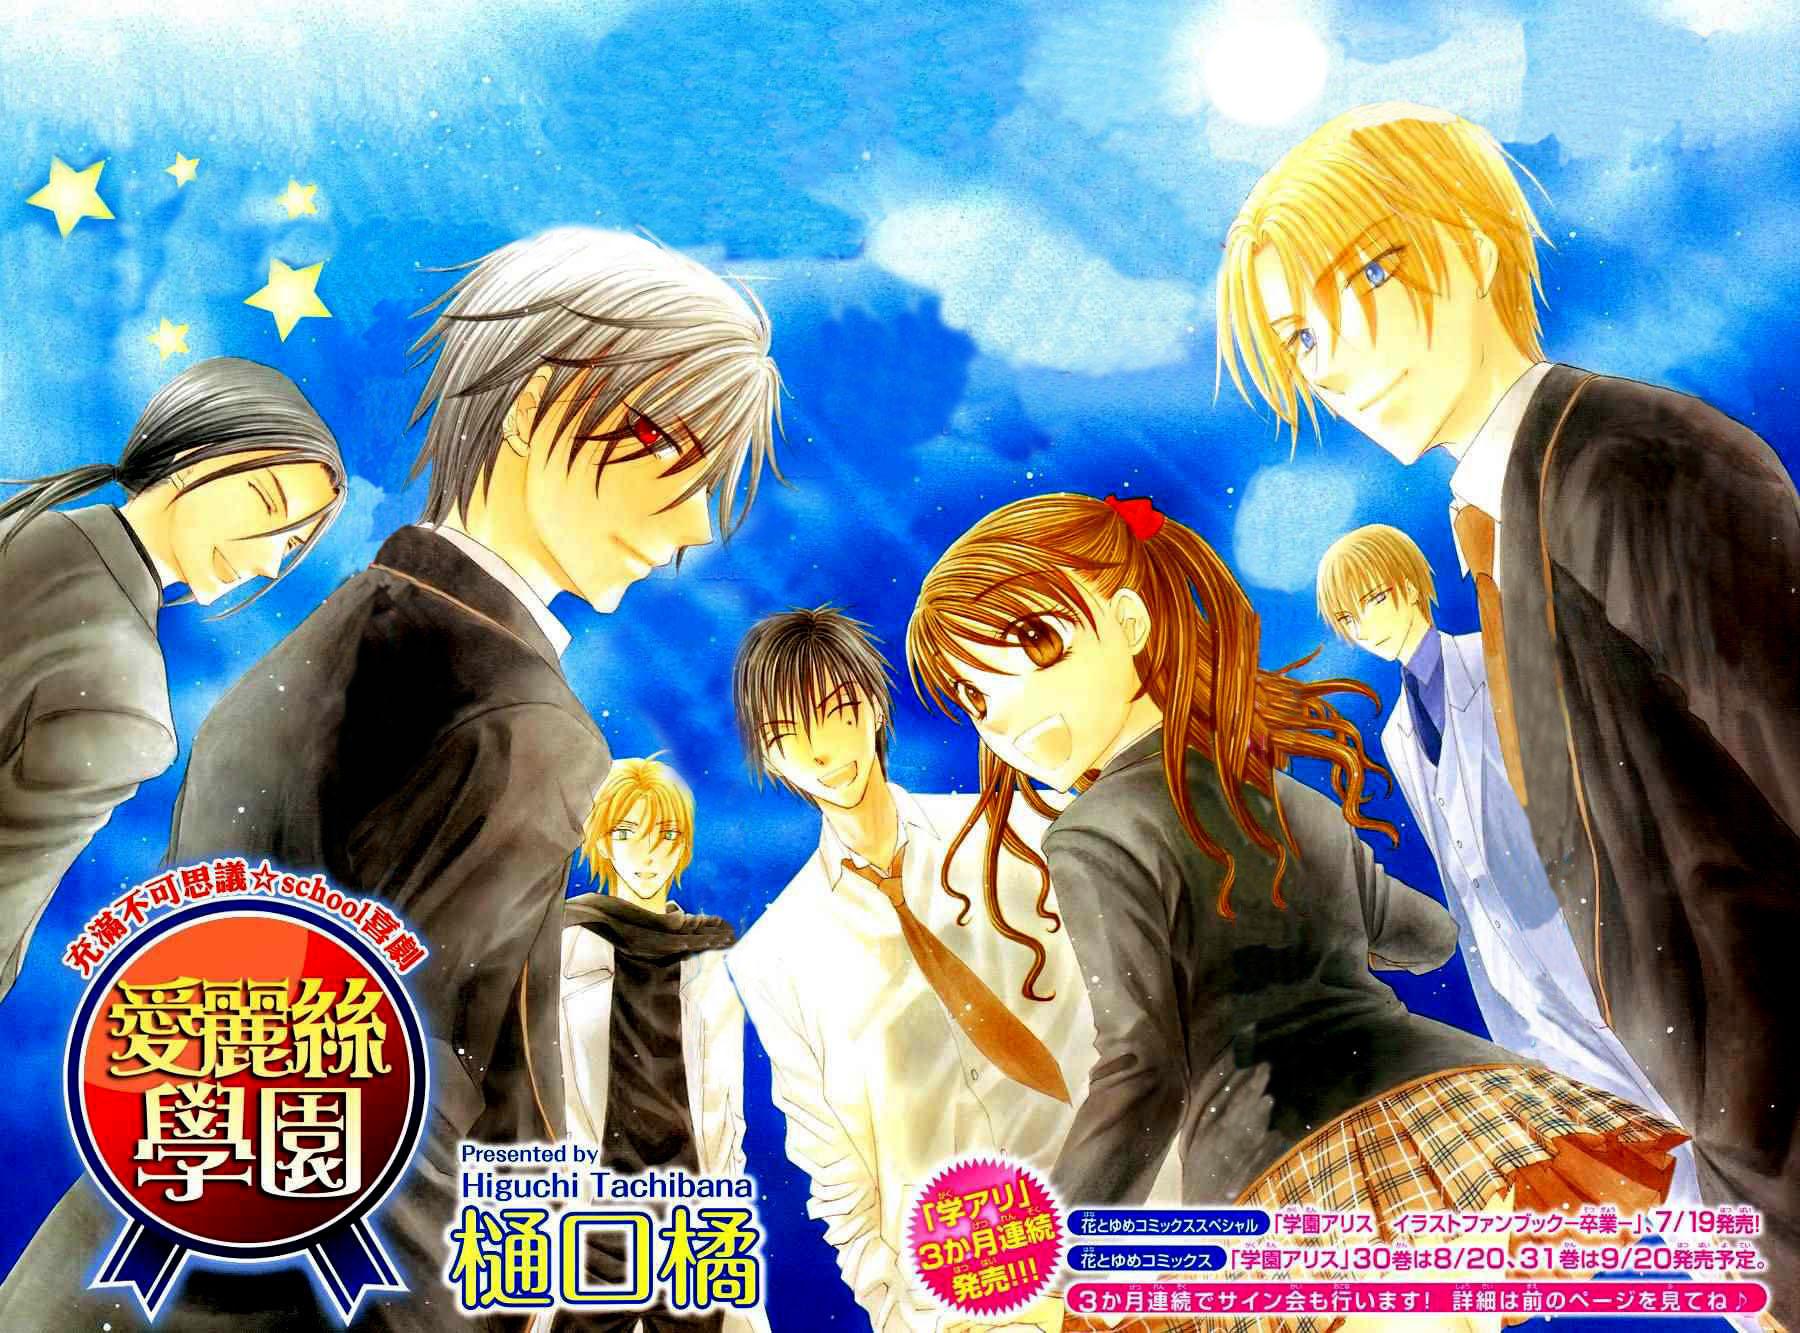 https://c5.mangatag.com/es_manga/39/551/438570/0995bb712b9fc14c6d964a432e6524f3.jpg Page 1